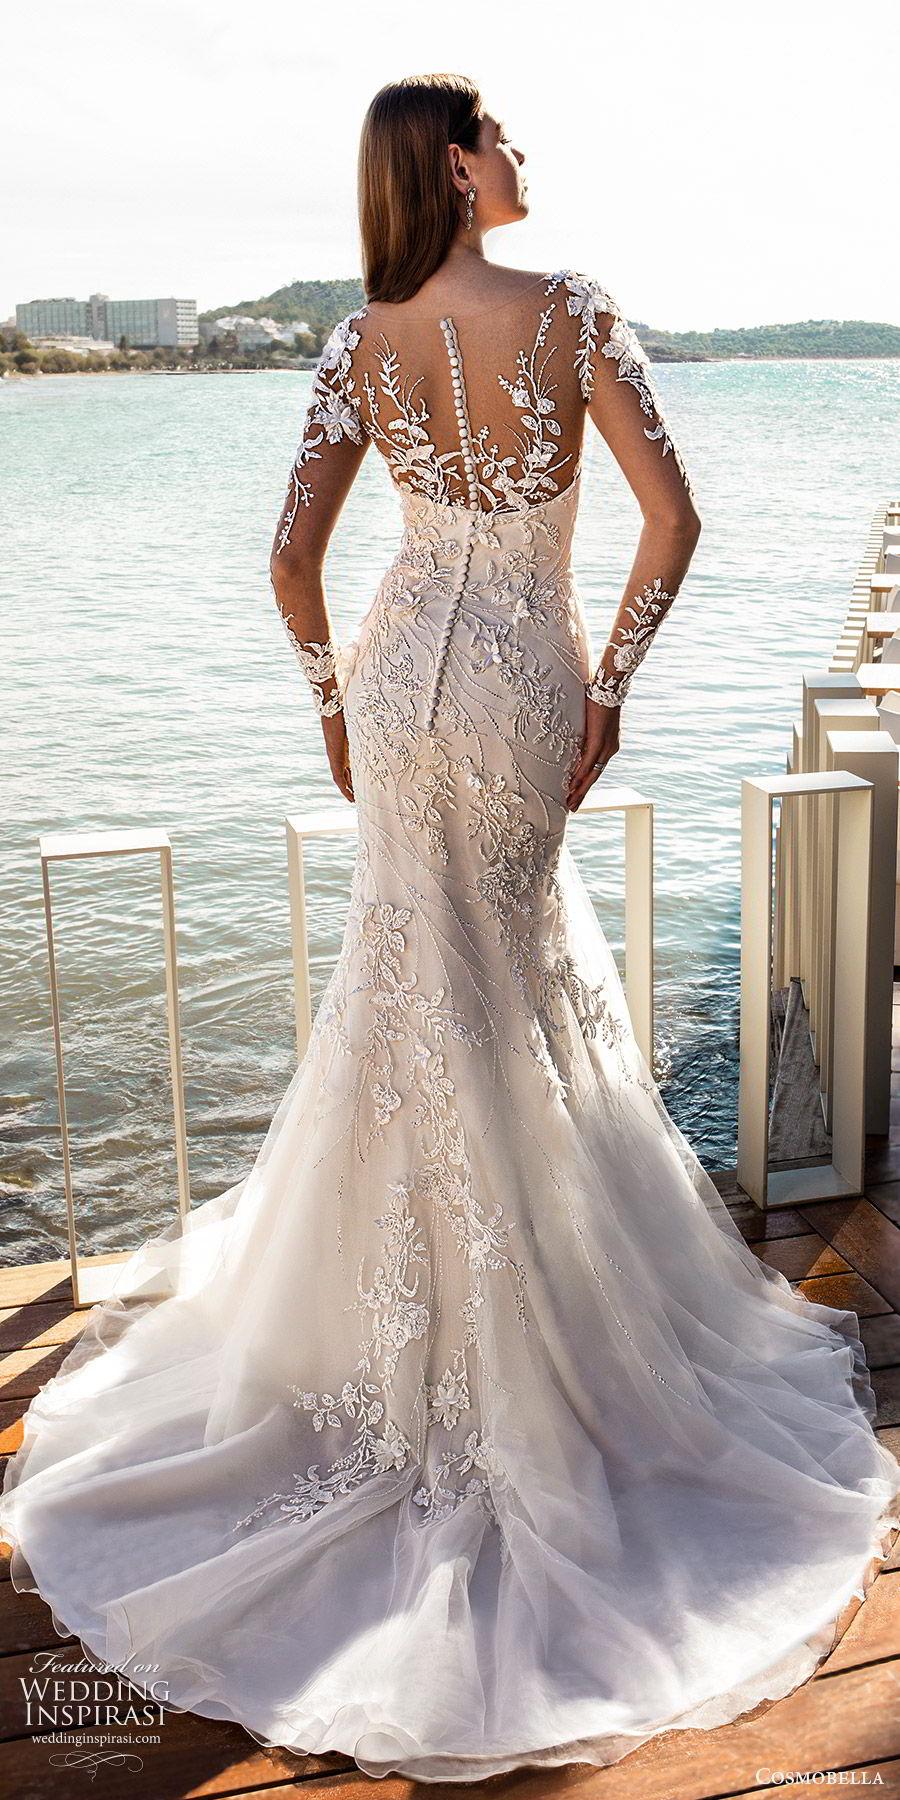 cosmobella 2020 bridal illusion long sleeves sheer bateau neck sweetheart fully embellished fit flare mermaid wedding dress (12) glitzy glam chapel train bv